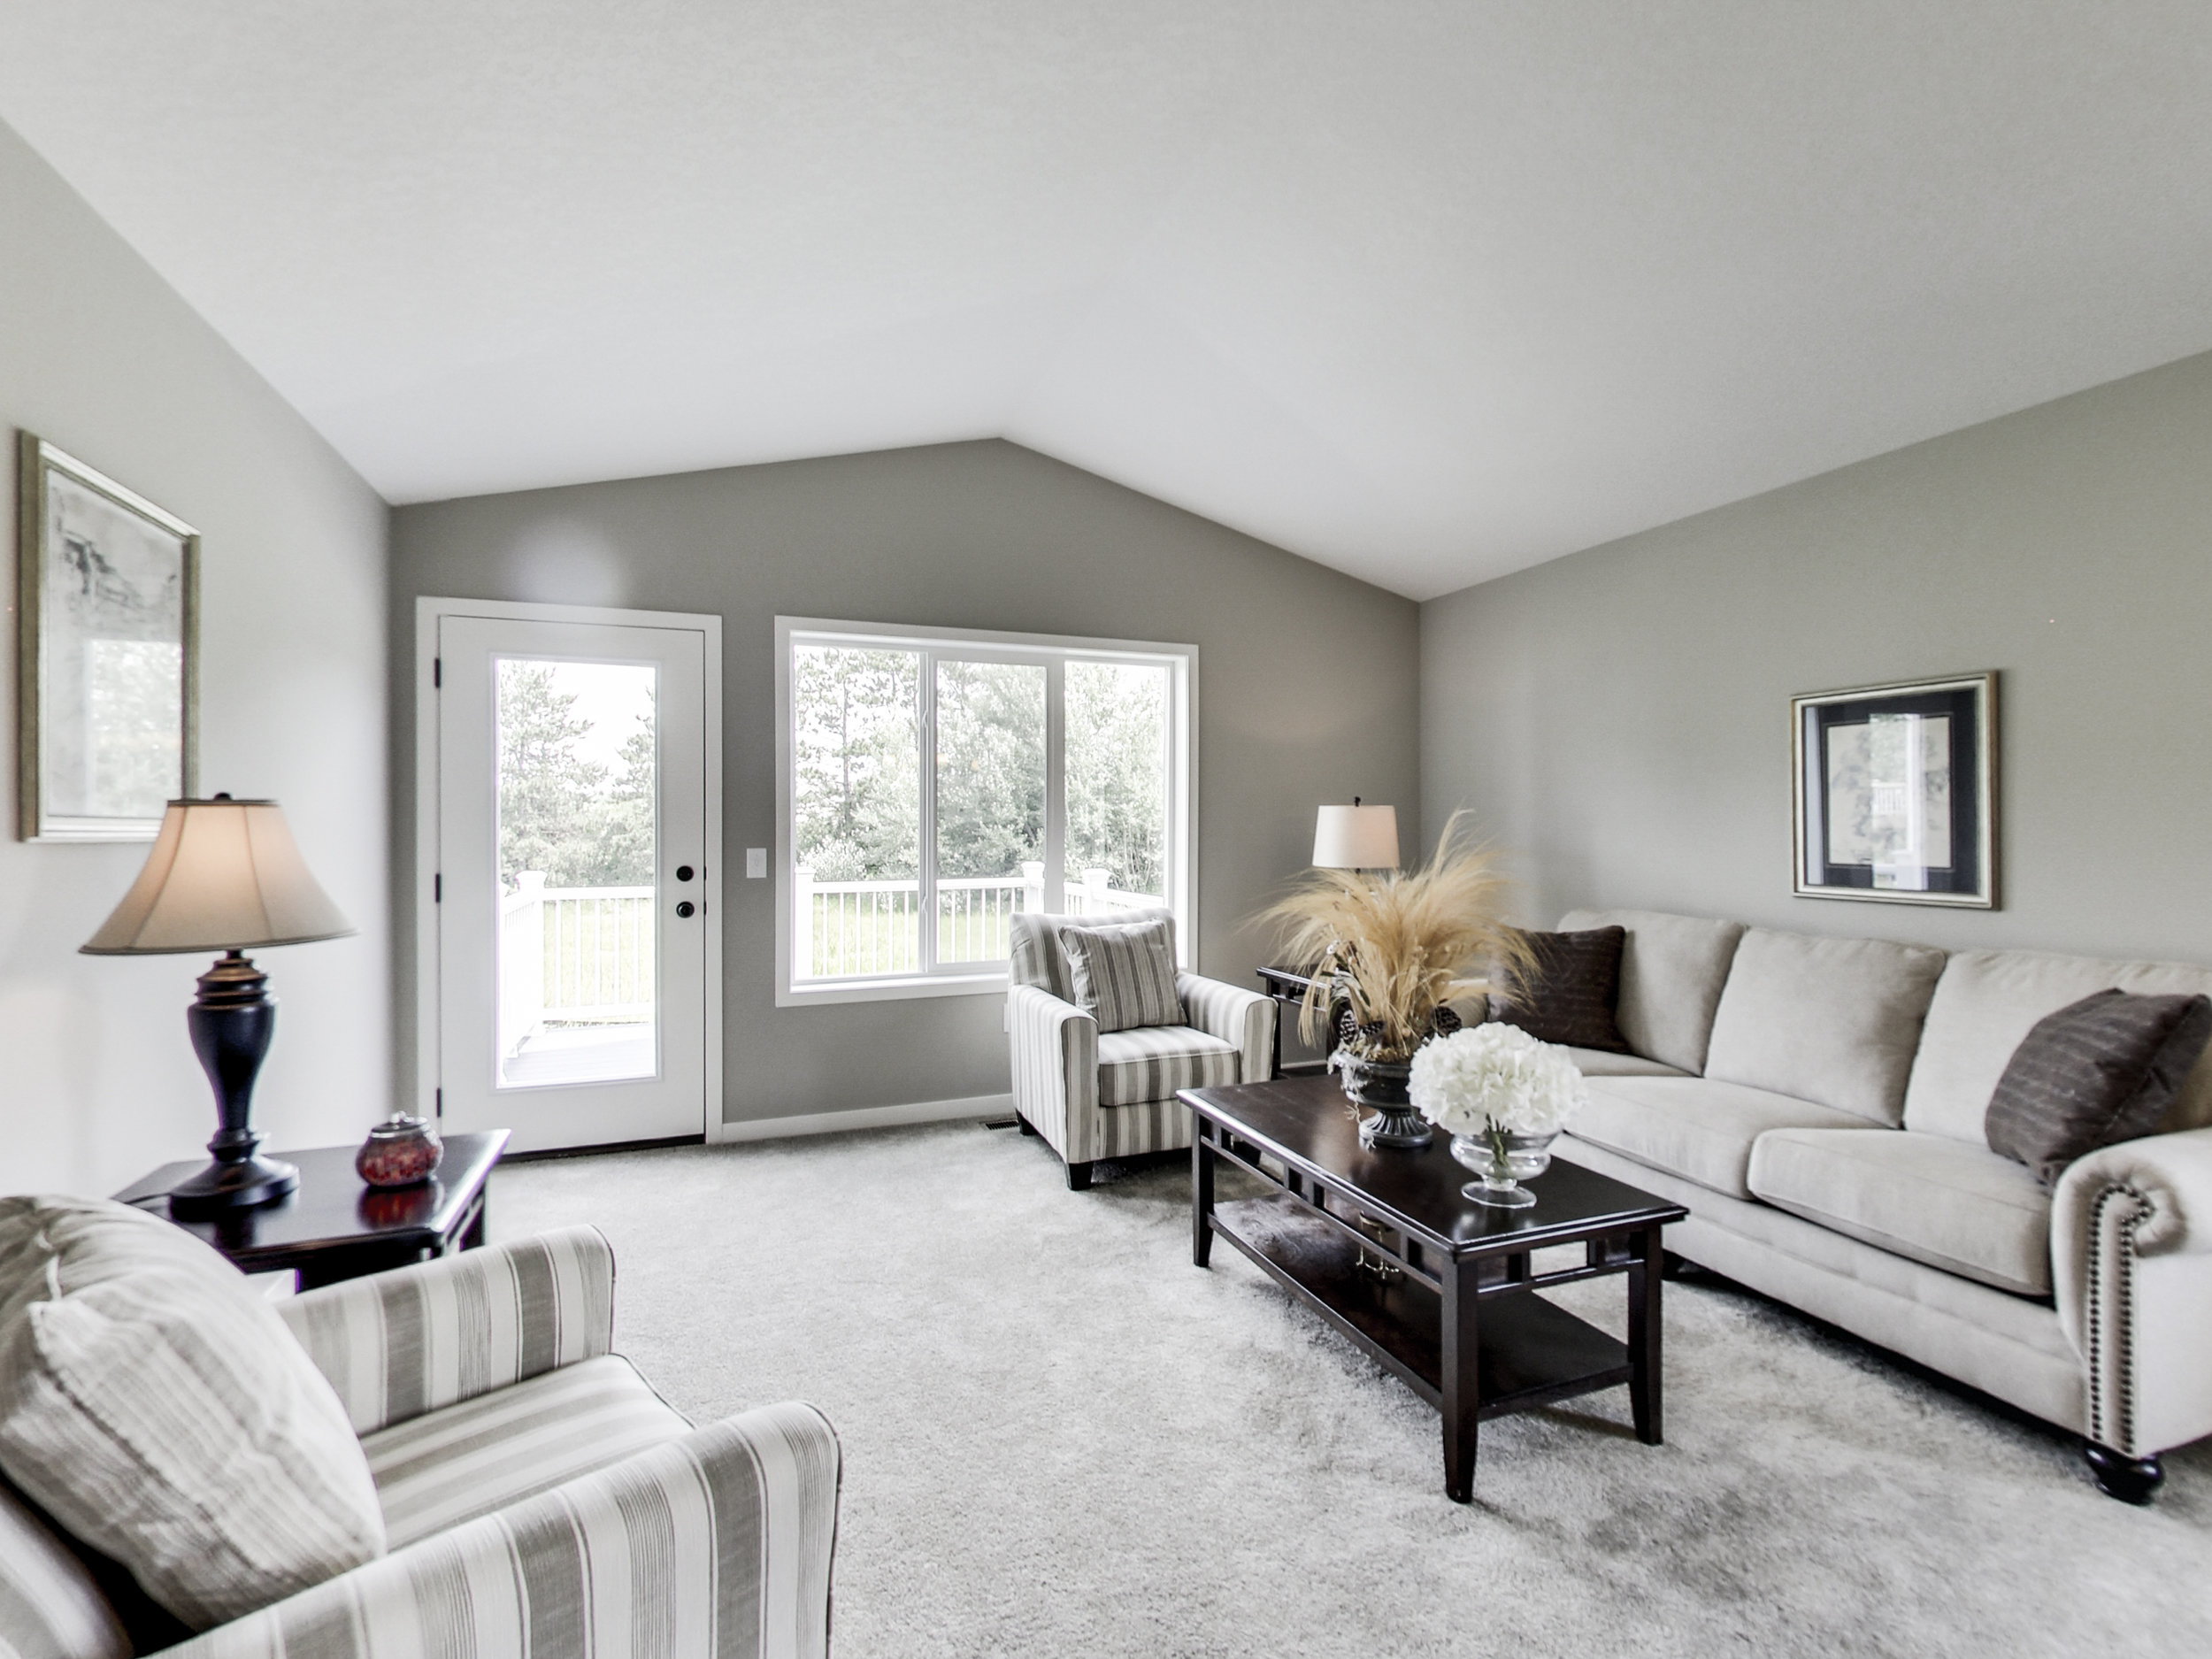 Flooring, Tile, Counters, Interior Colors    Village Floor & Wall  2221 - 108th Lane NE Blaine, MN 55449 (P) 763-210-3000   www.villagefloor.com  Contact: Tricia Bloch  TriciaB@villagefloor.com